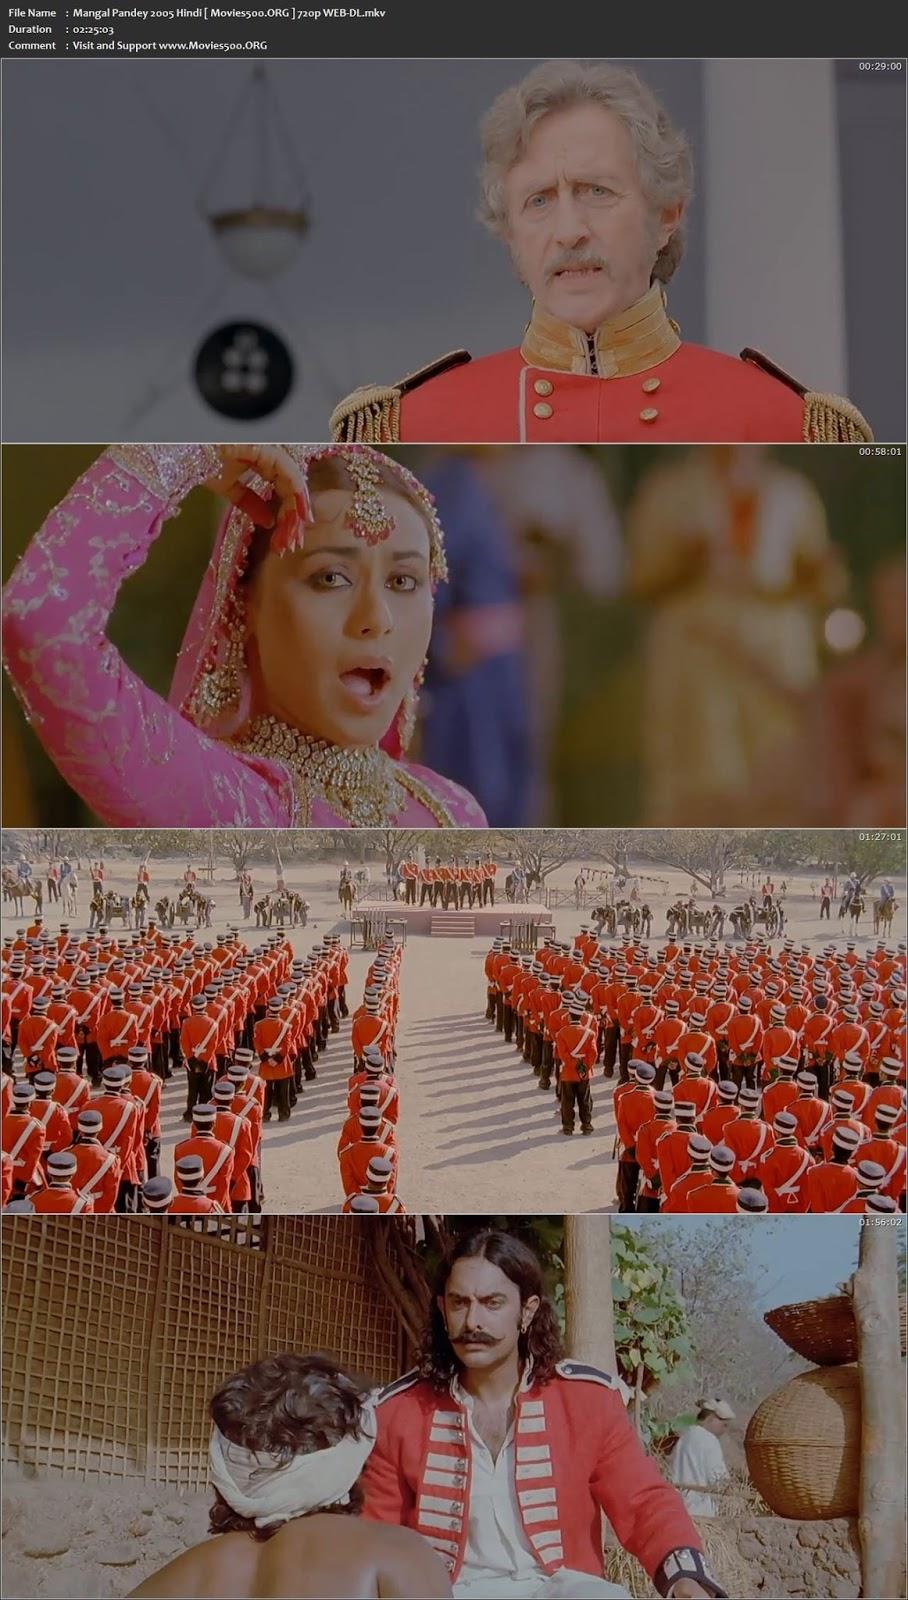 Mangal Pandey 2005 Hindi Full Movie 720p WEB DL 1GB at movies500.site